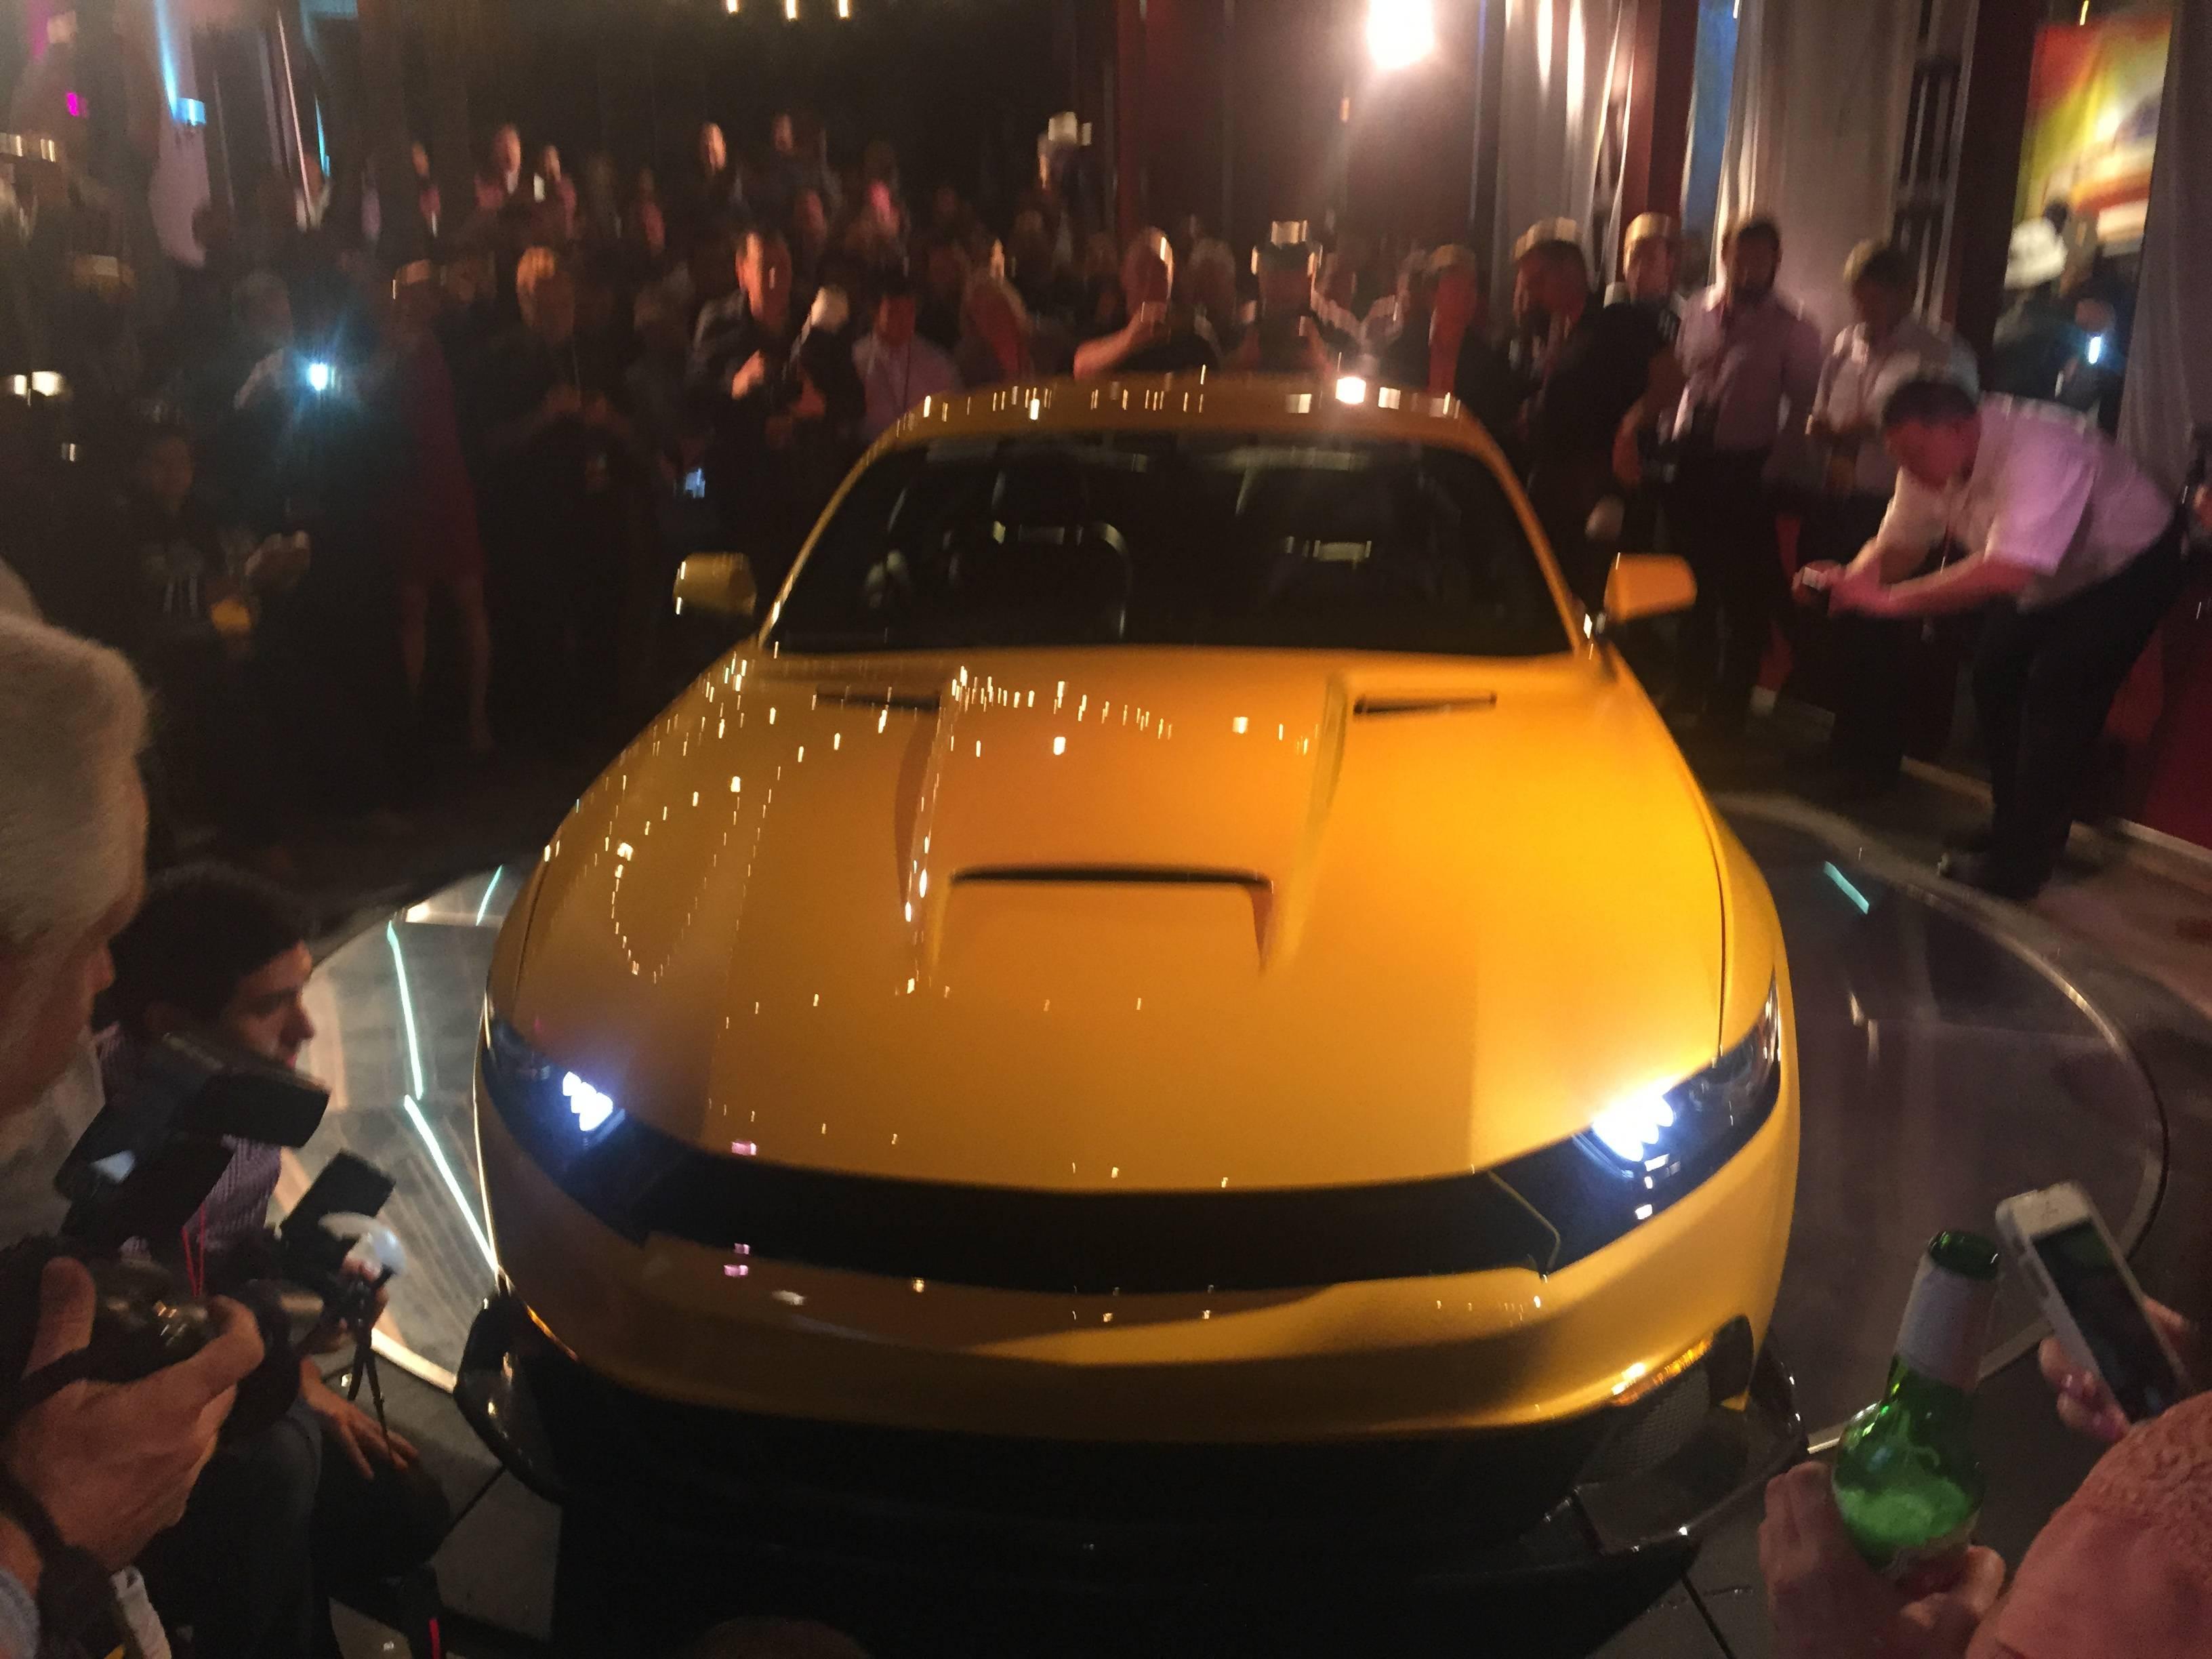 2015 Mustang Saleen S302 Black Label | AmcarGuide.com ...